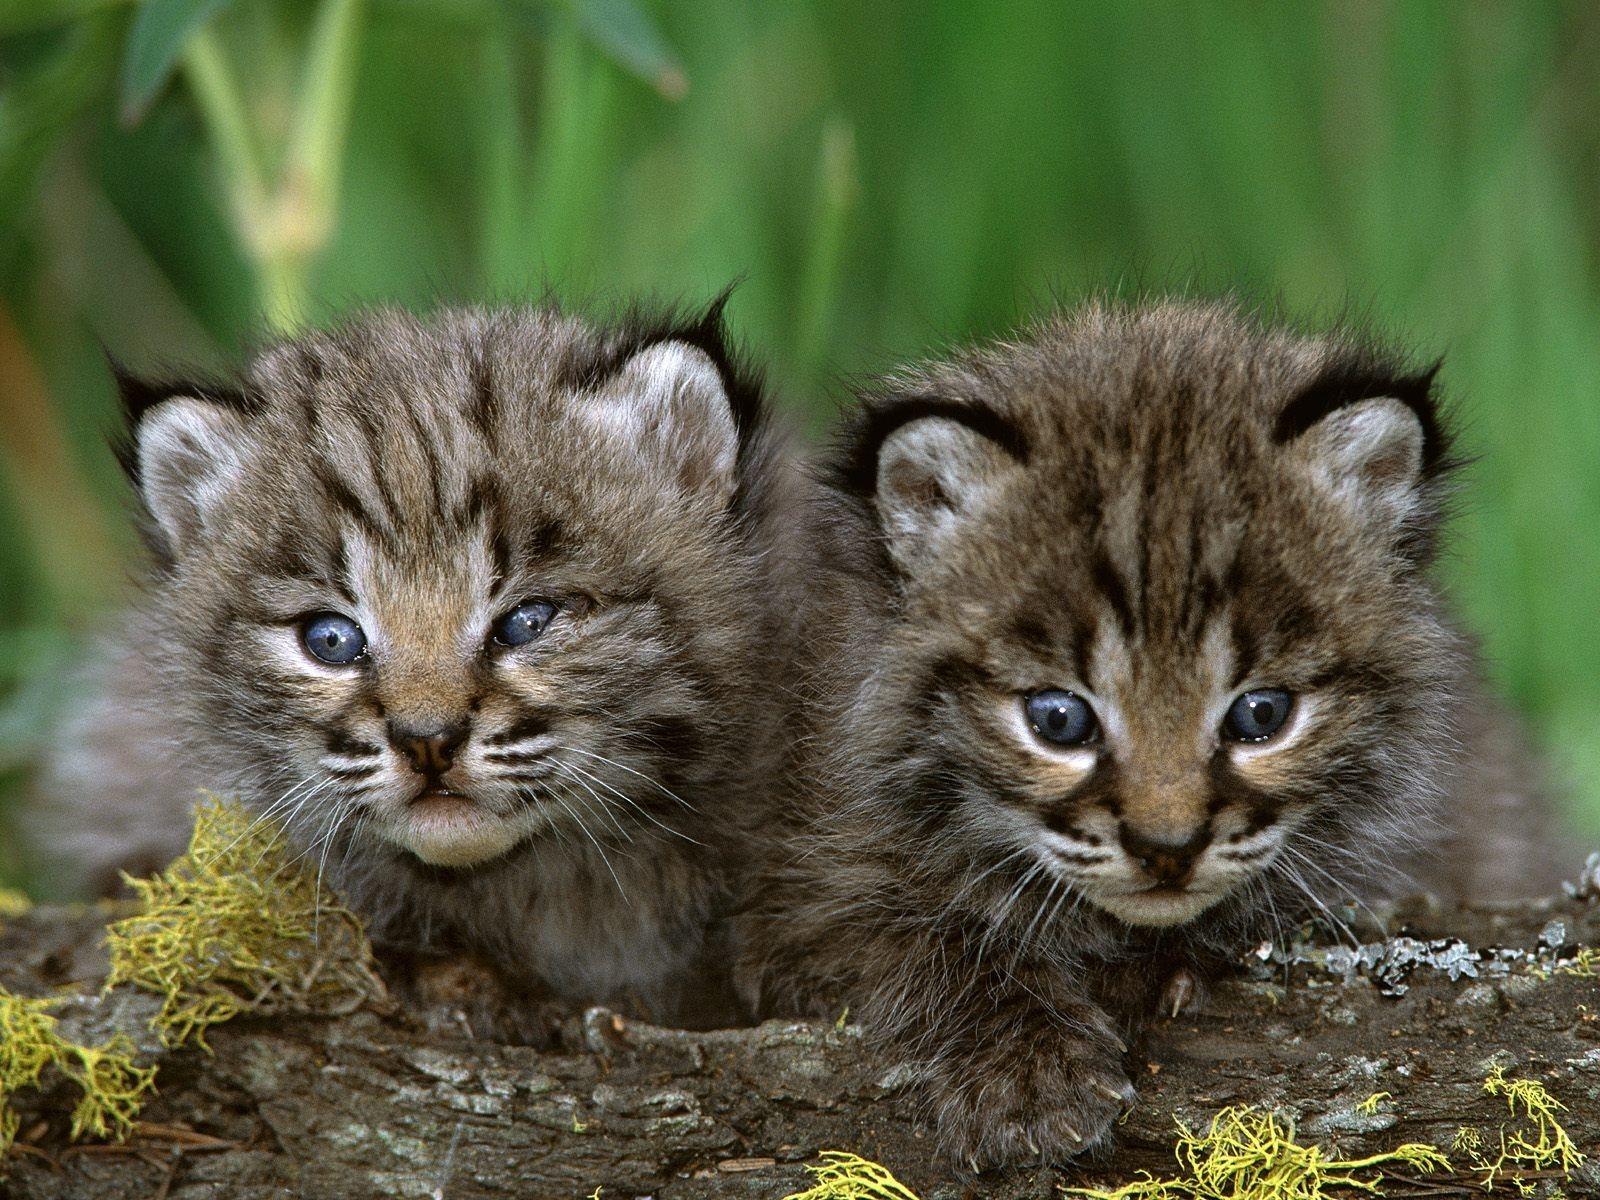 Little Cute Animals World Inside Pictures Cute Animals Cute Baby Animals Bobcat Kitten